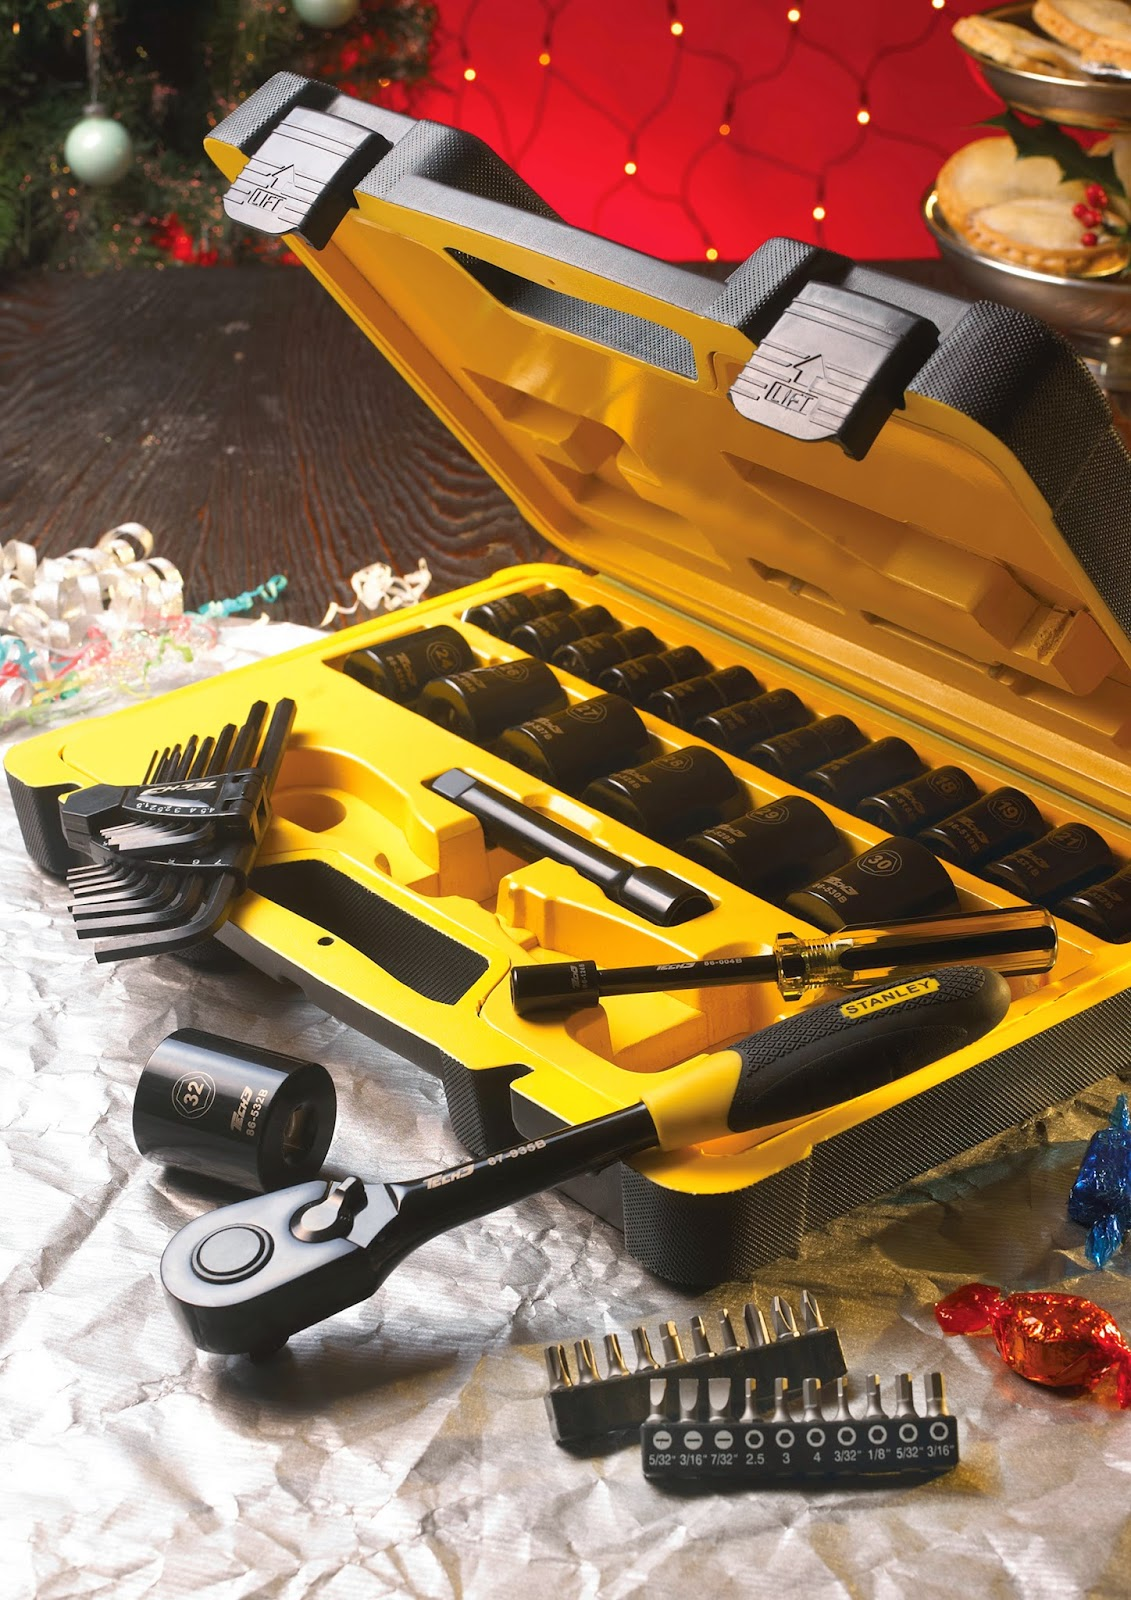 http://www.beesleyandfildes.co.uk/stanley-57-piece-1-2-sq-drive-tech-3-socket-set-ref-xms14sock12/